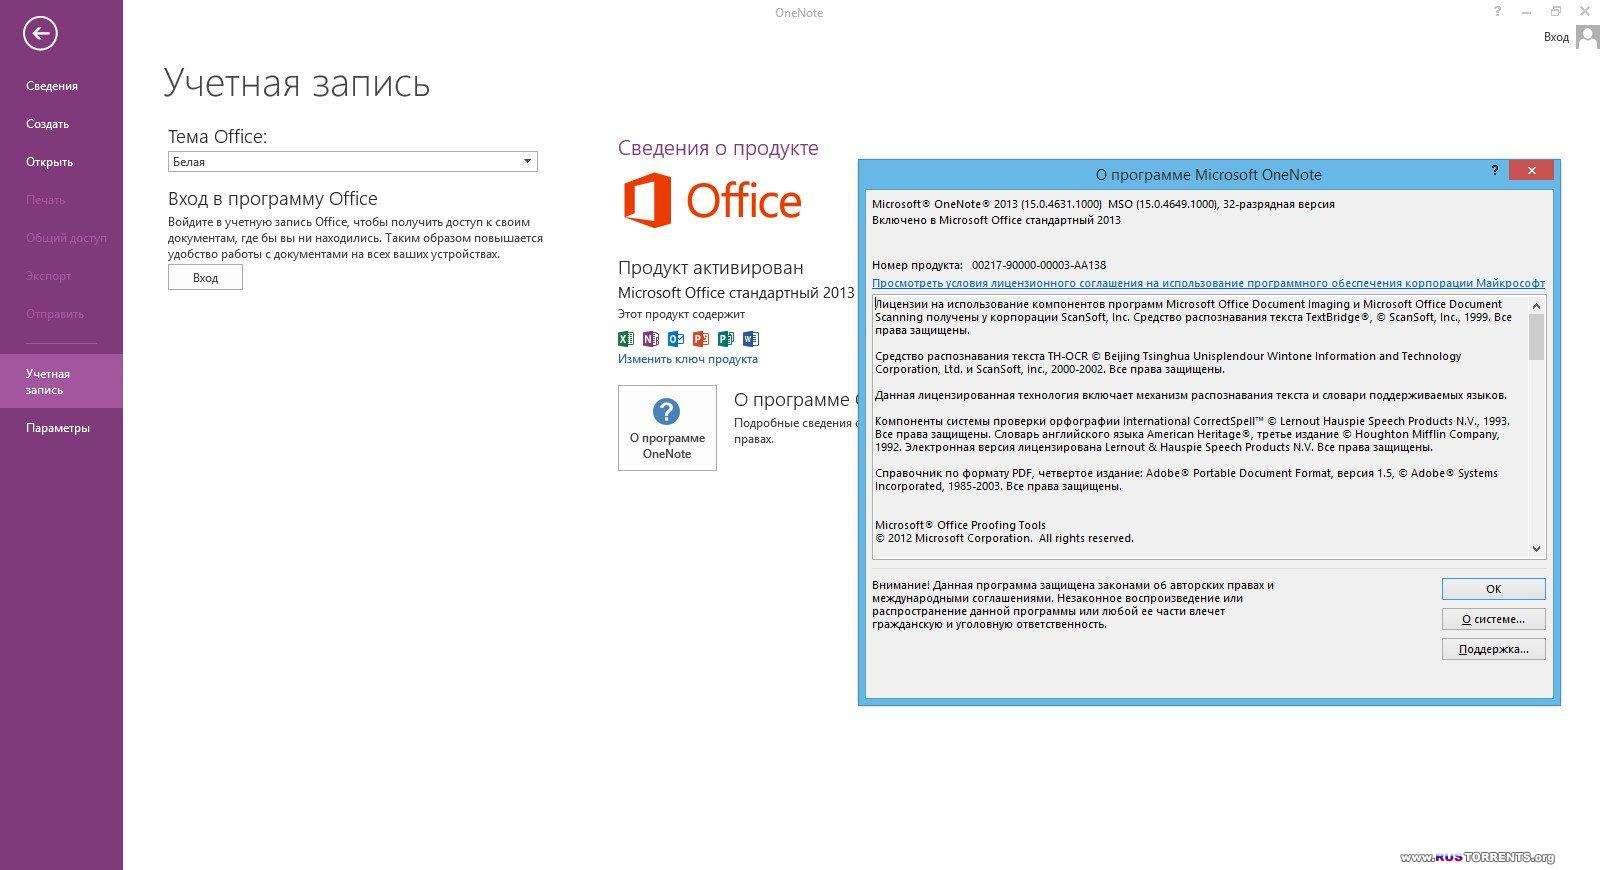 Microsoft Office 2013 SP1 Standard 15.0.4649.1000 RePack by D!akov